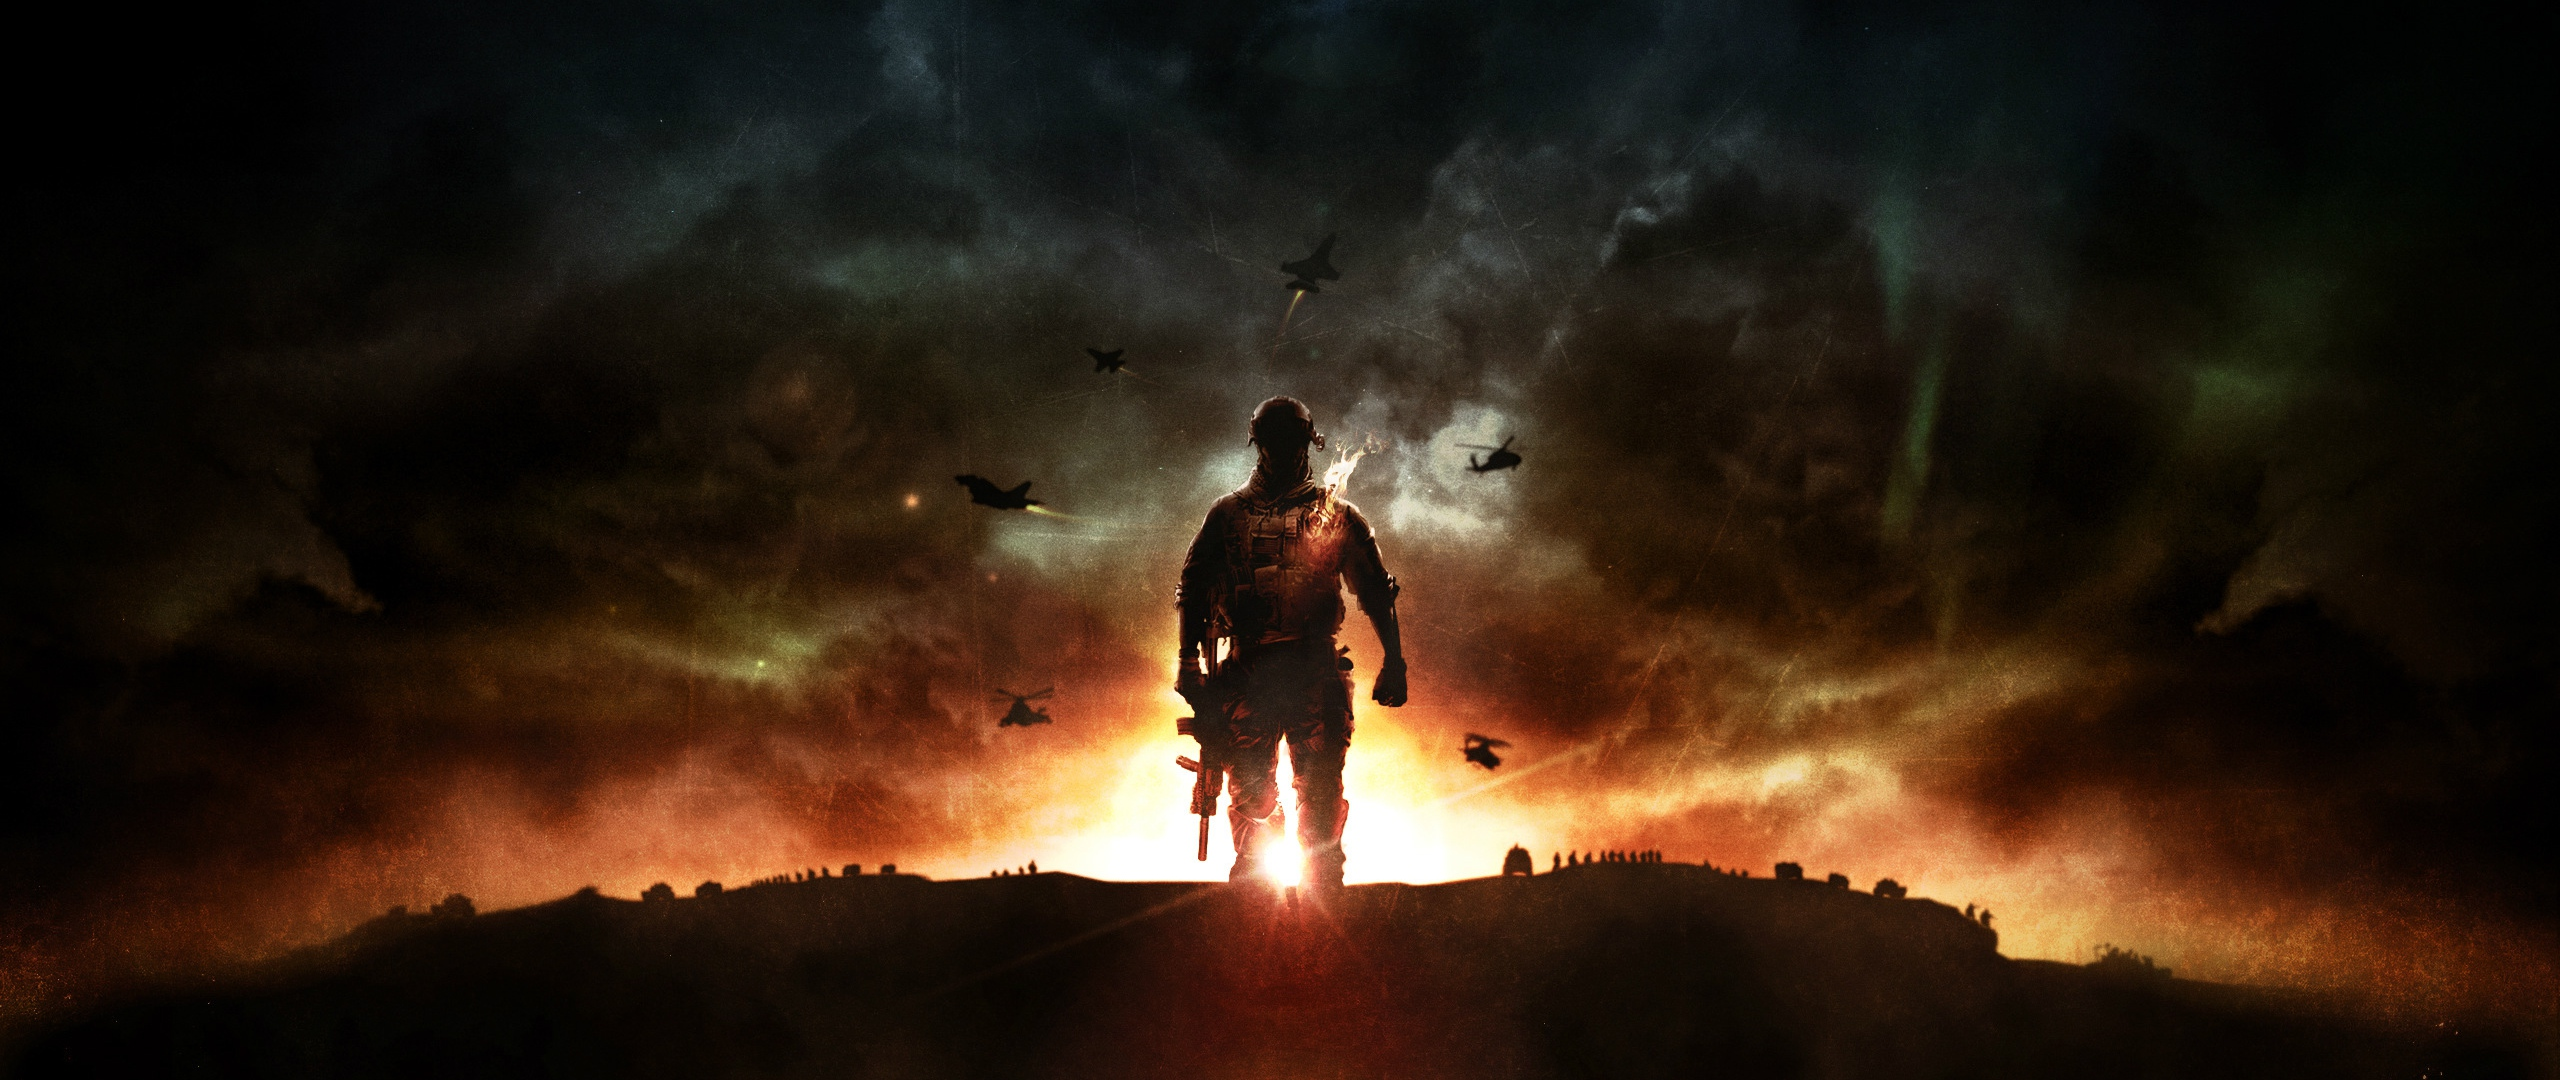 Download Wallpaper 2560x1080 battlefield 4 game explosion ea 2560x1080